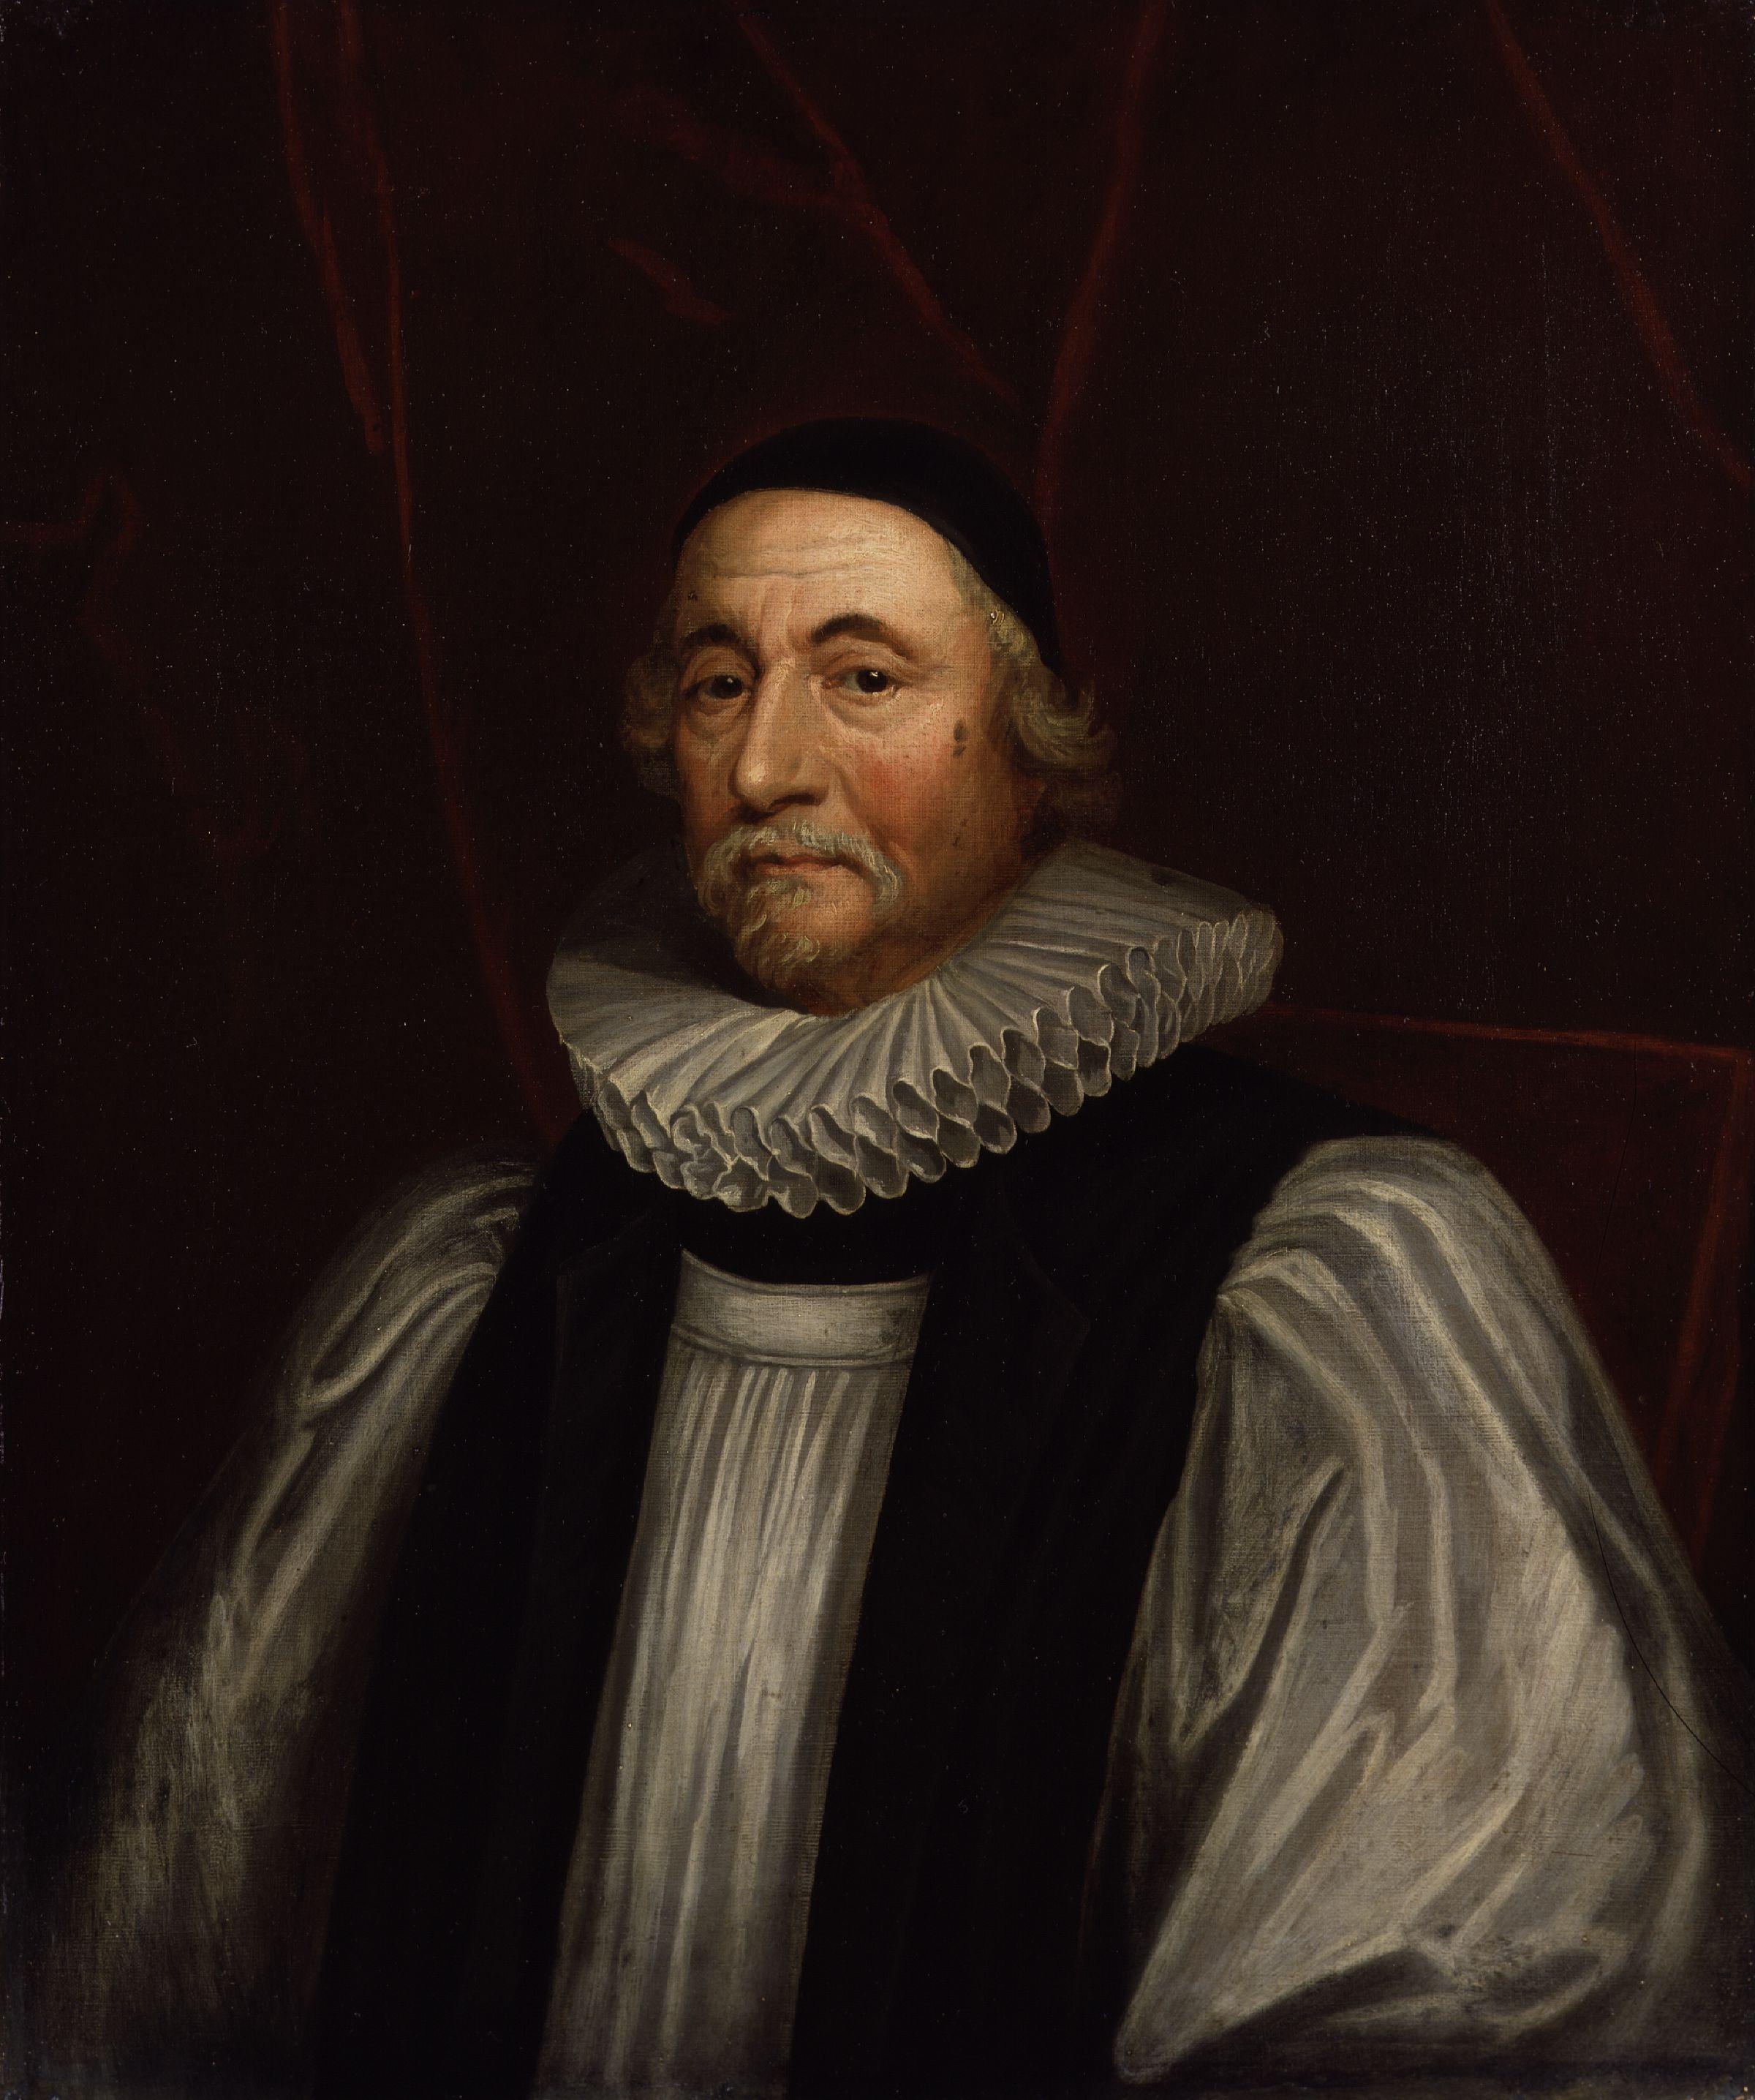 protestanttinen dating Irlanti